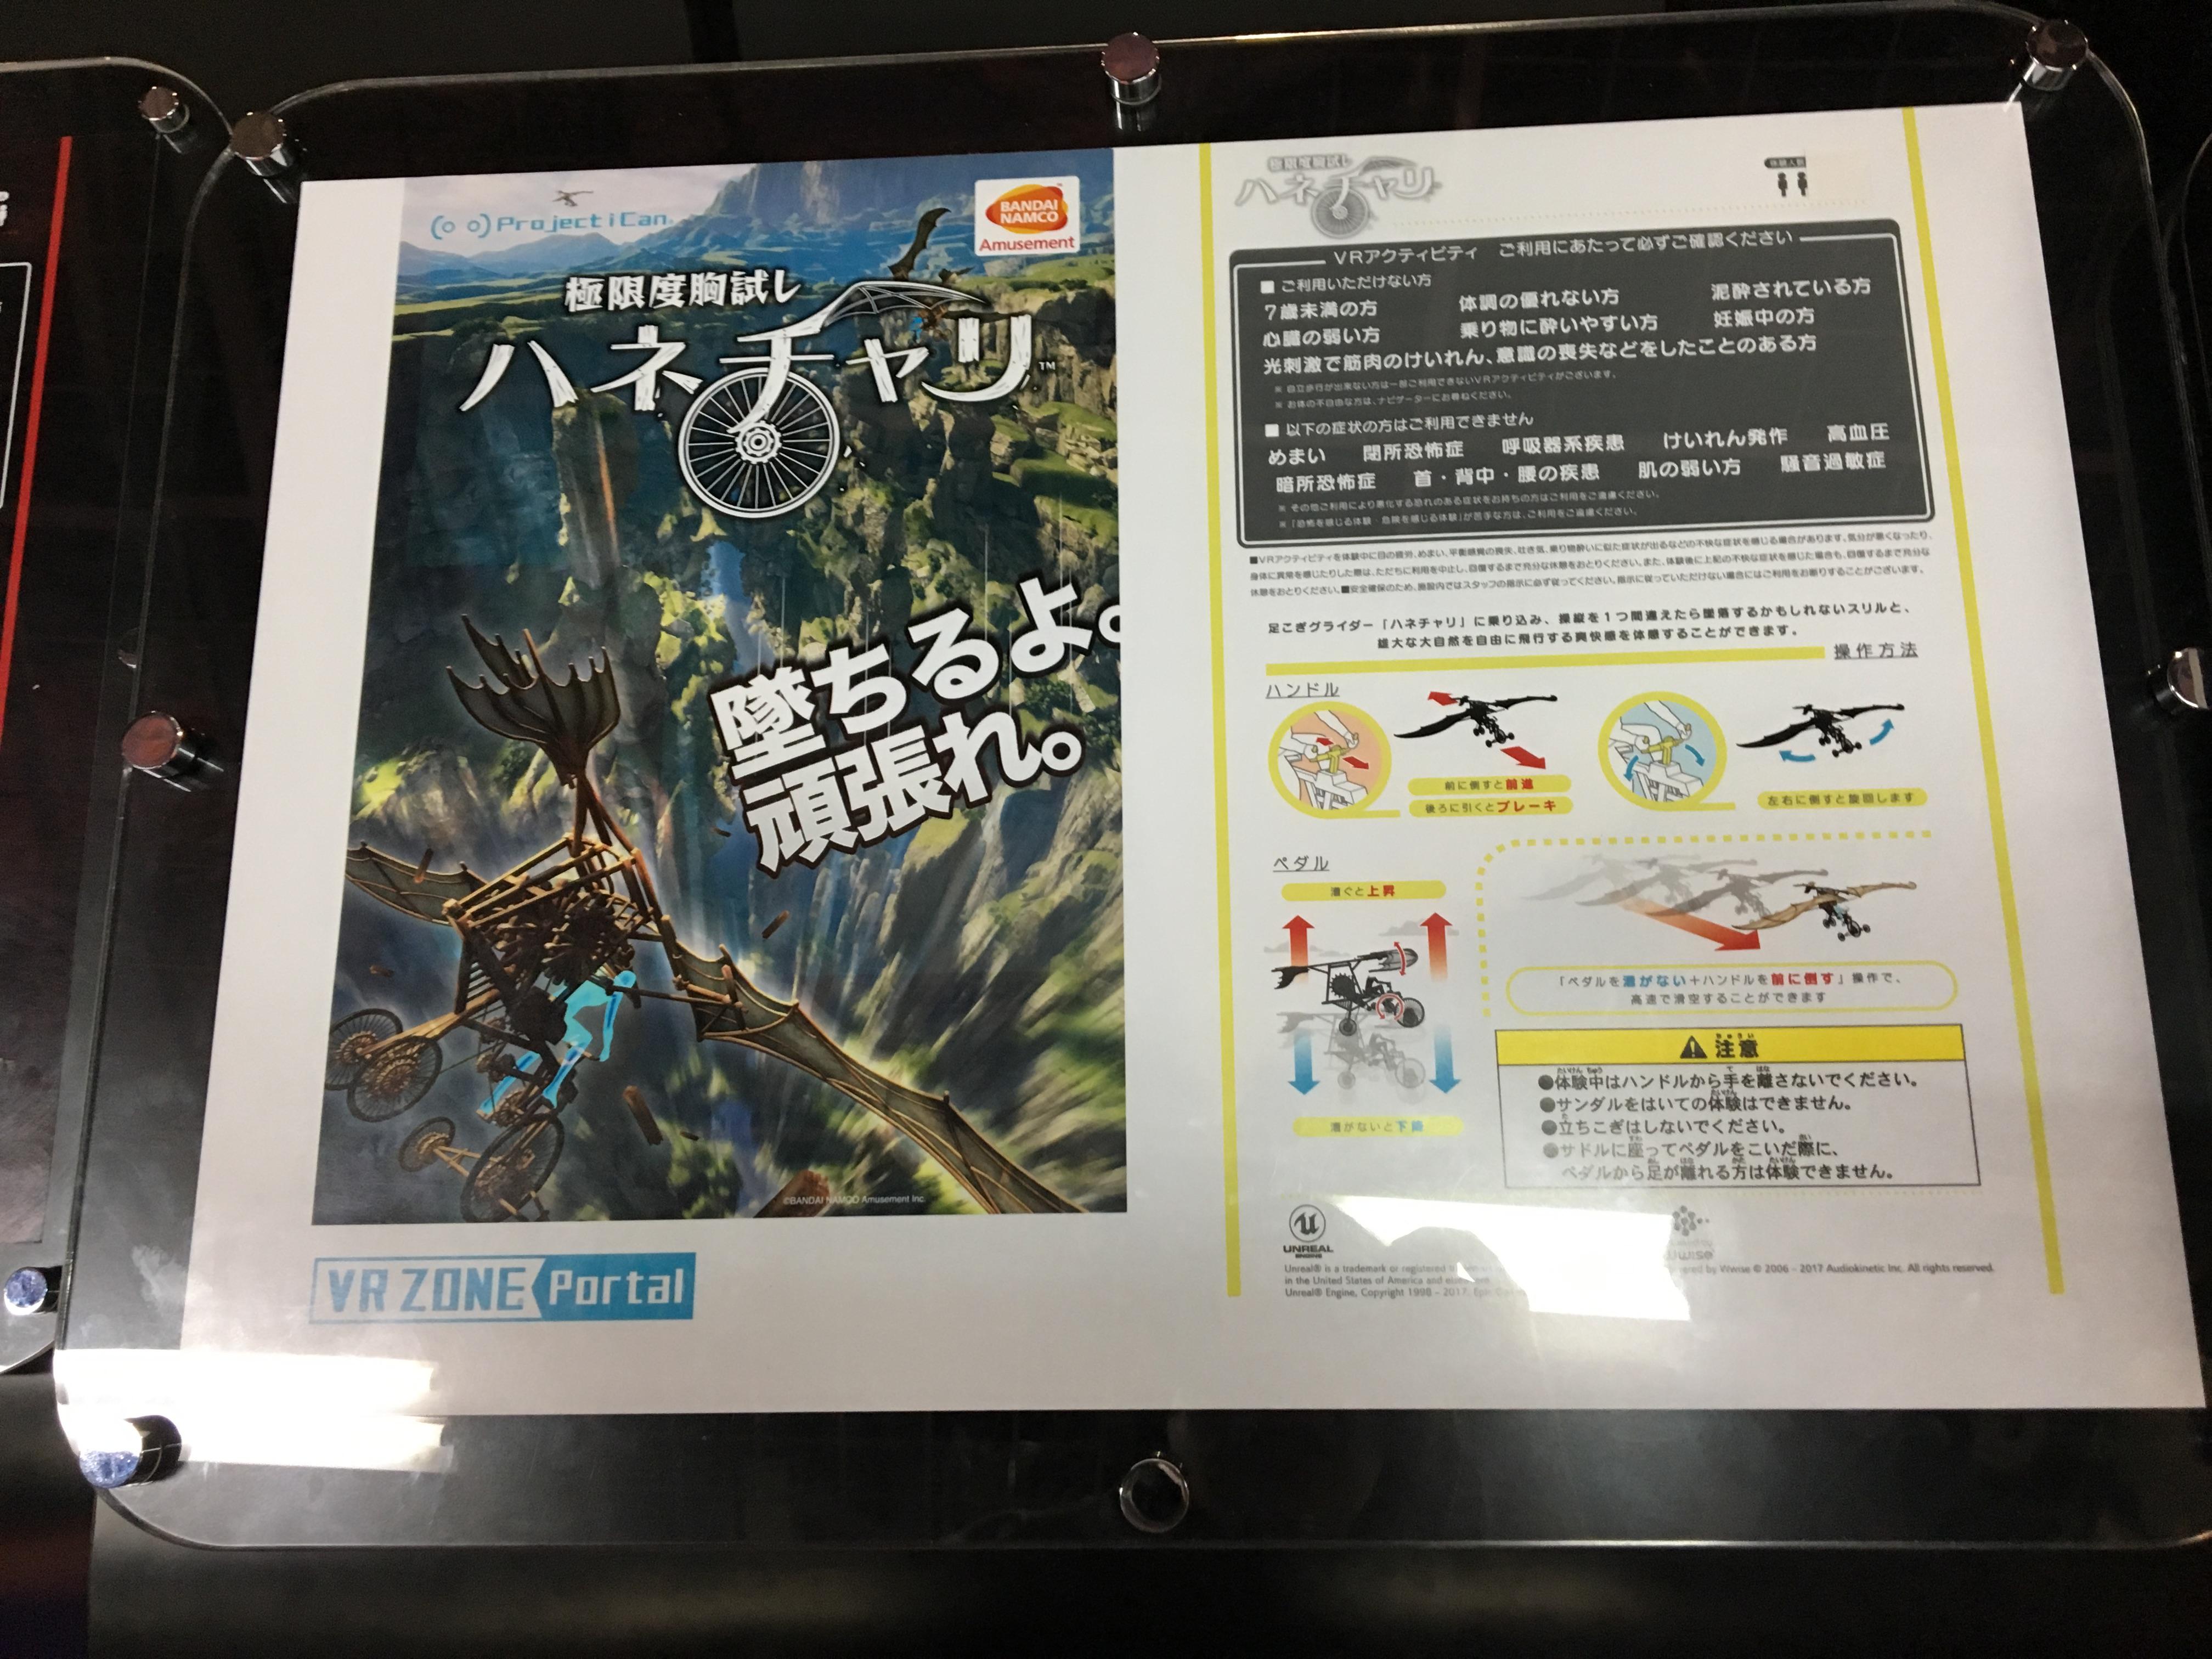 『VR ZONE Portal』namco札幌エスタ店で体験できるハネチャリ